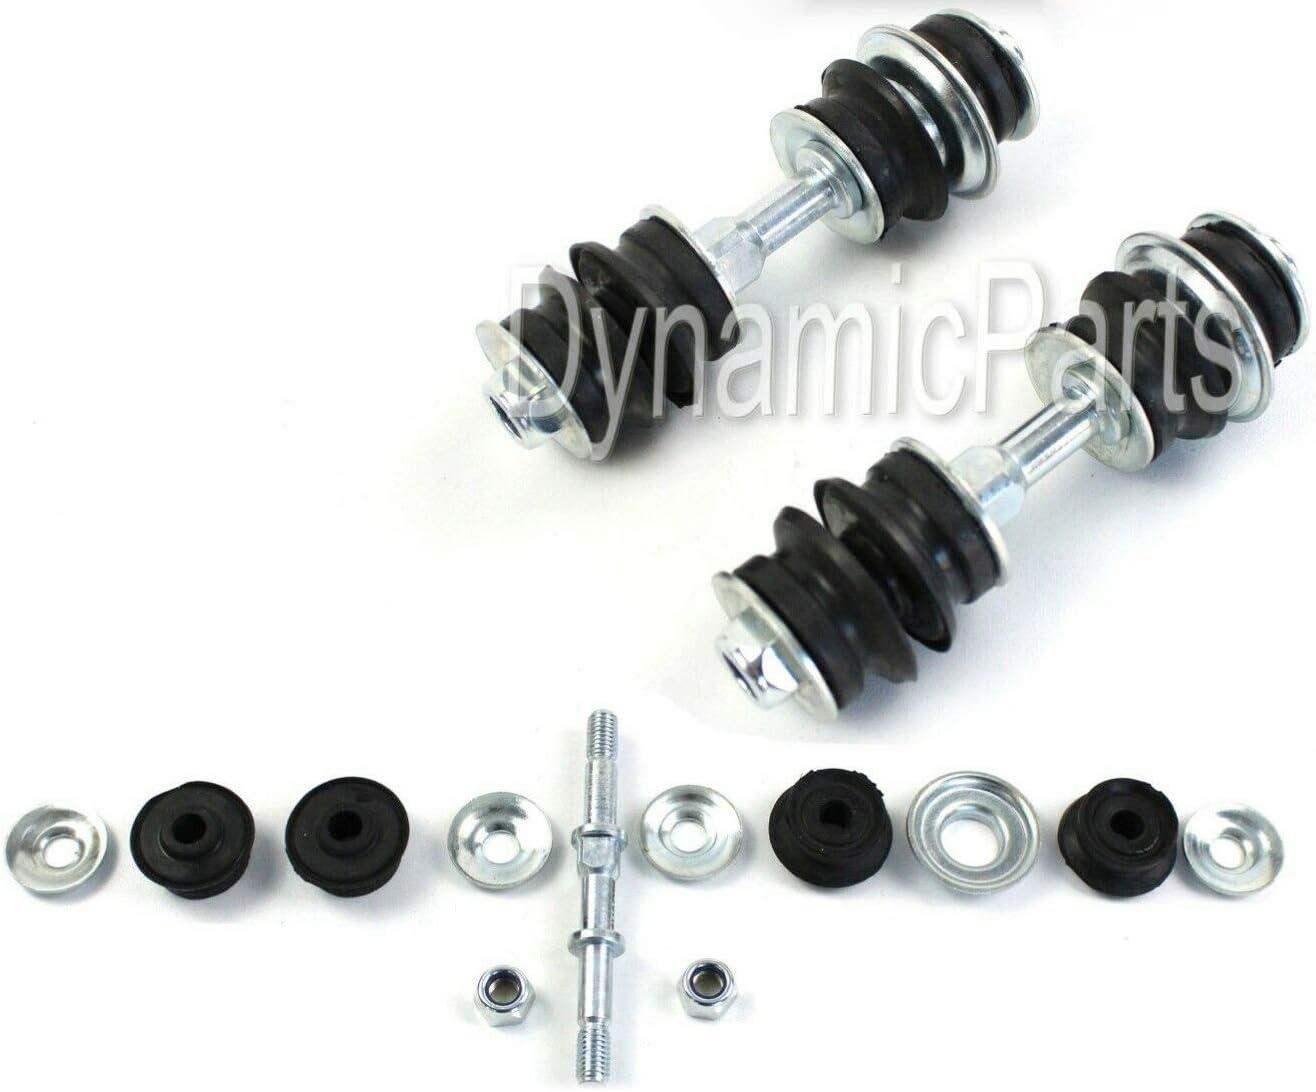 Yaris Front Stabiliser Anti Roll Bar Drop Links 9418210800 1999-2005 Pair